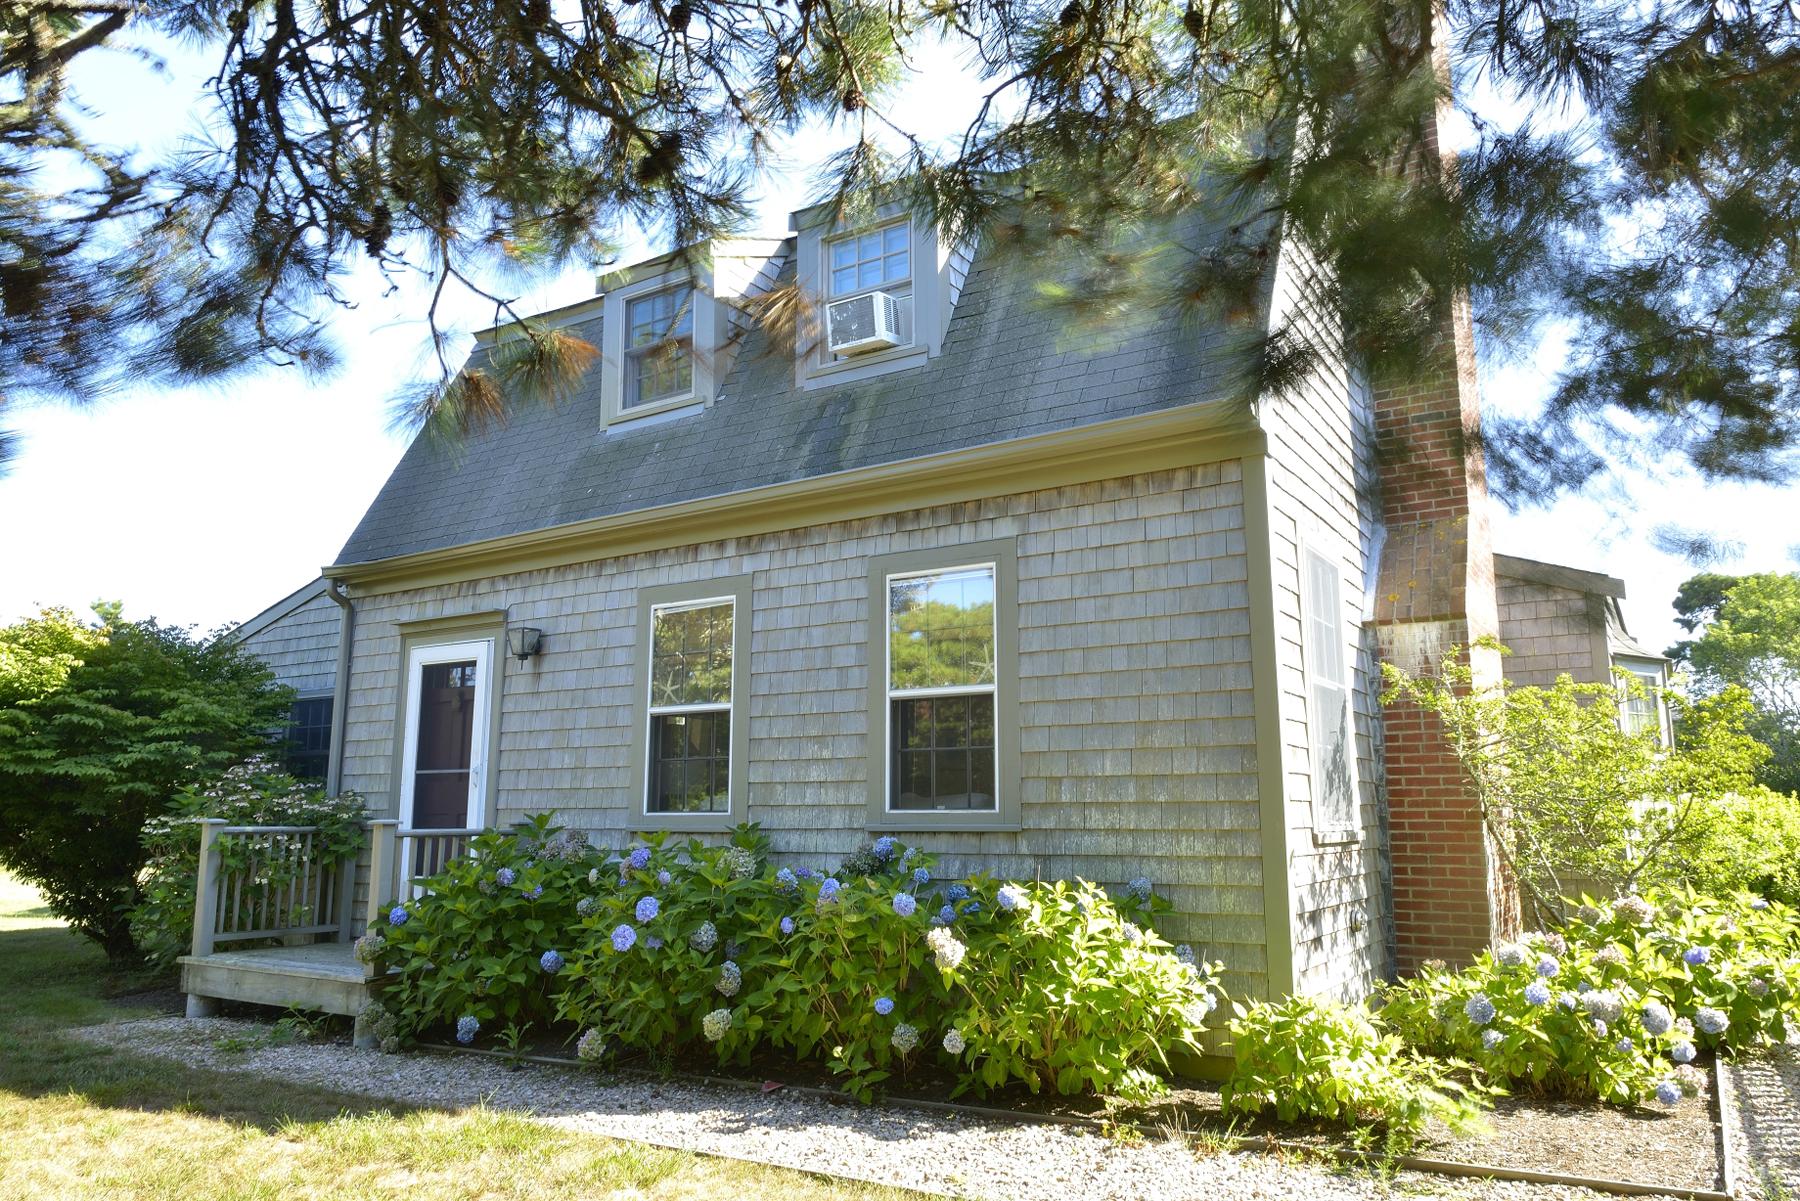 Casa Unifamiliar por un Venta en Surfside Main House and Guest Cottage 15 Masaquet Avenue Nantucket, Massachusetts 02554 Estados Unidos